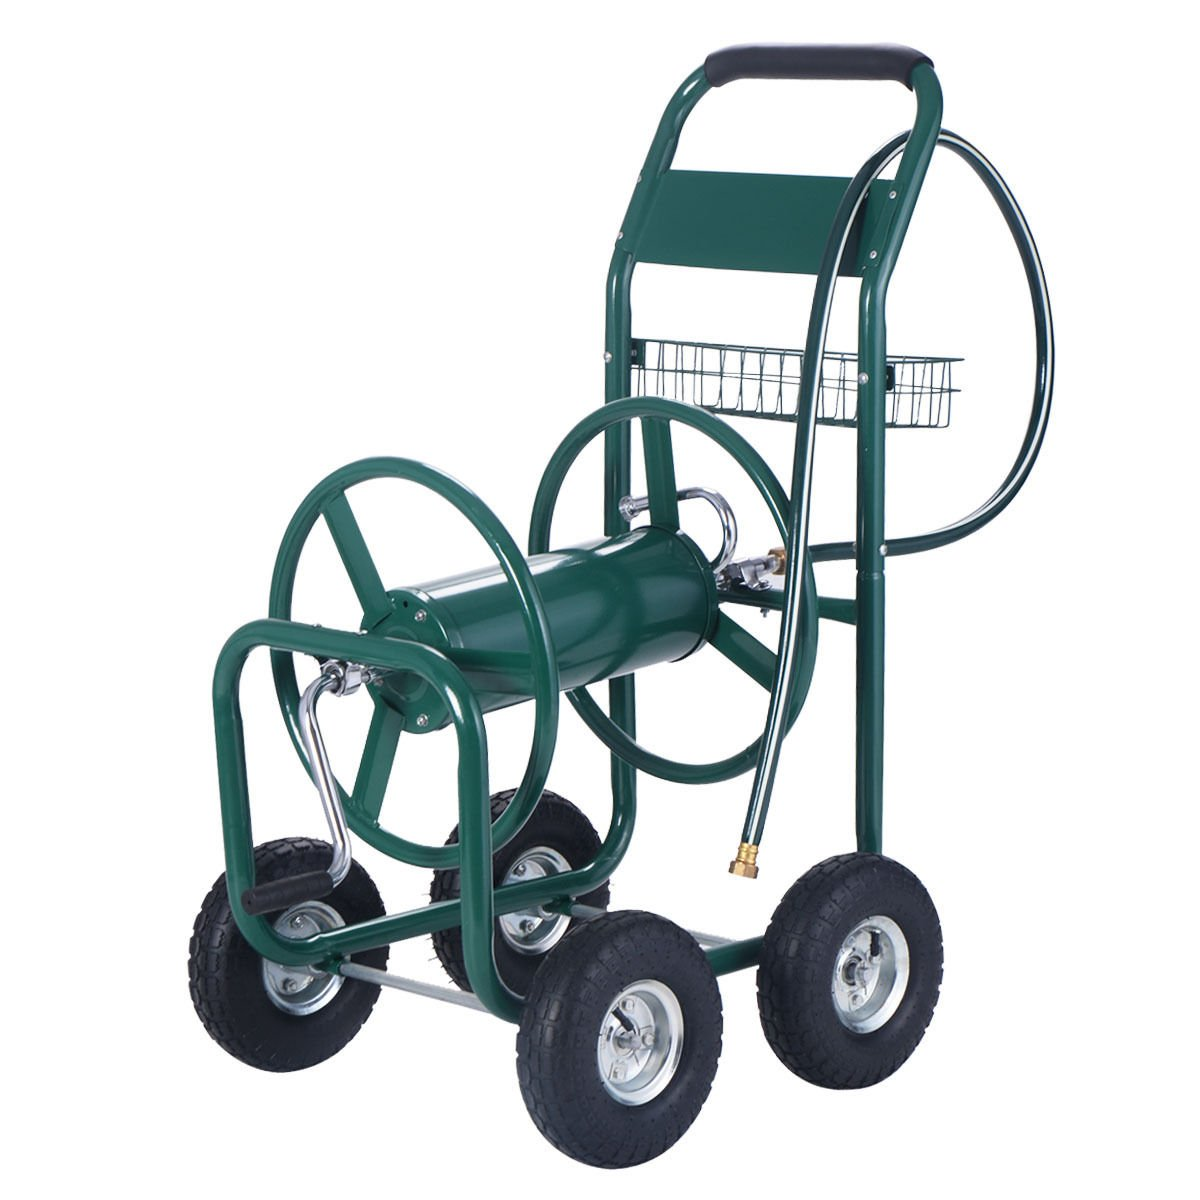 Giantex 300ft Garden Water Hose Reel Cart Outdoor Heavy Duty Yard Water Planting